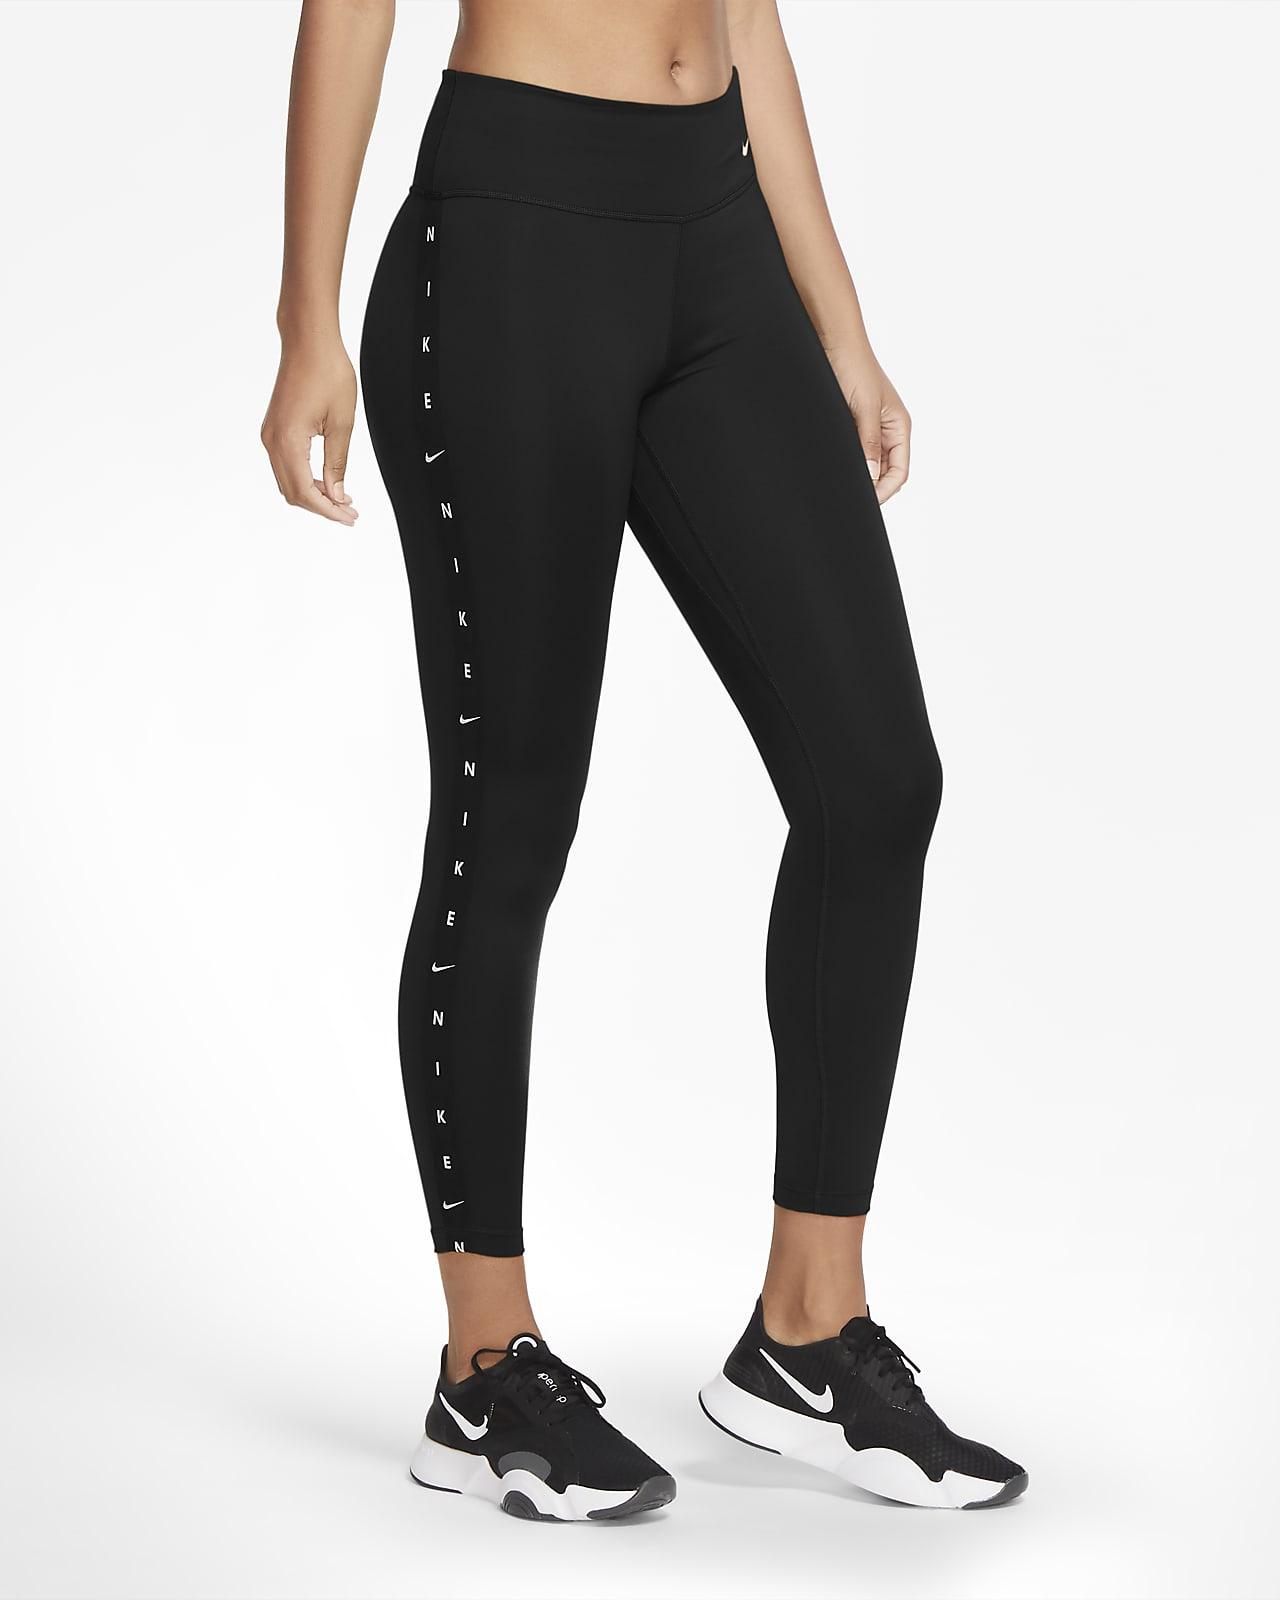 Legging 7/8 Nike One pour Femme